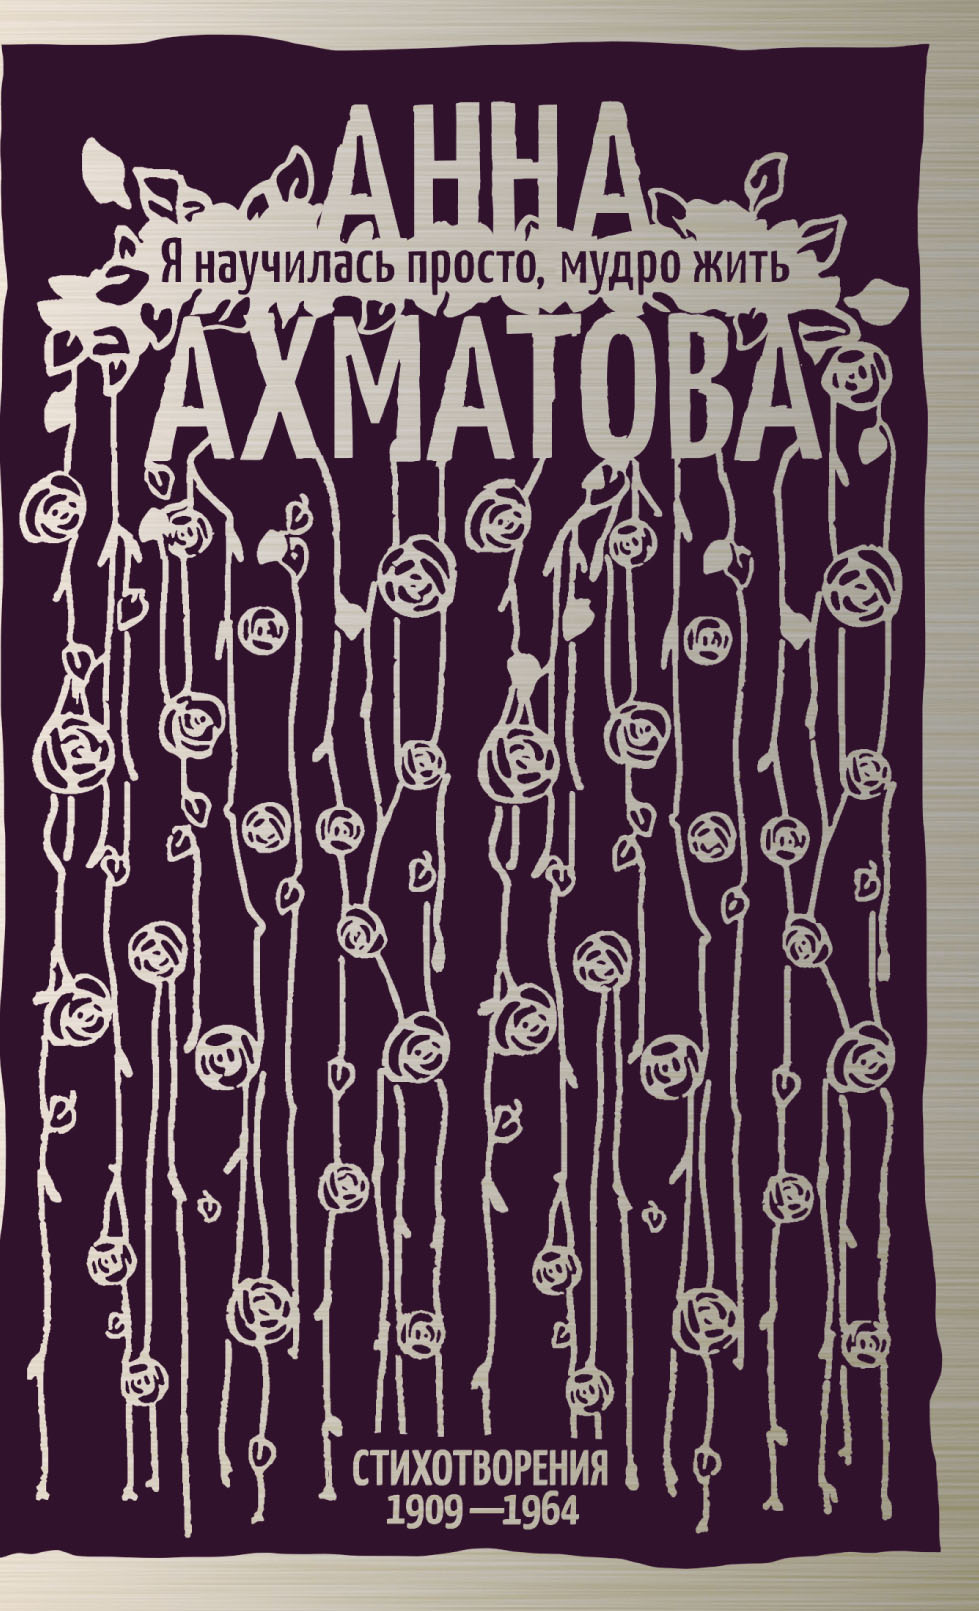 Анна Ахматова Я научилась просто, мудро жить. Стихотворения 1909—1964 анна ахматова поэзия интимности лекции arzamas